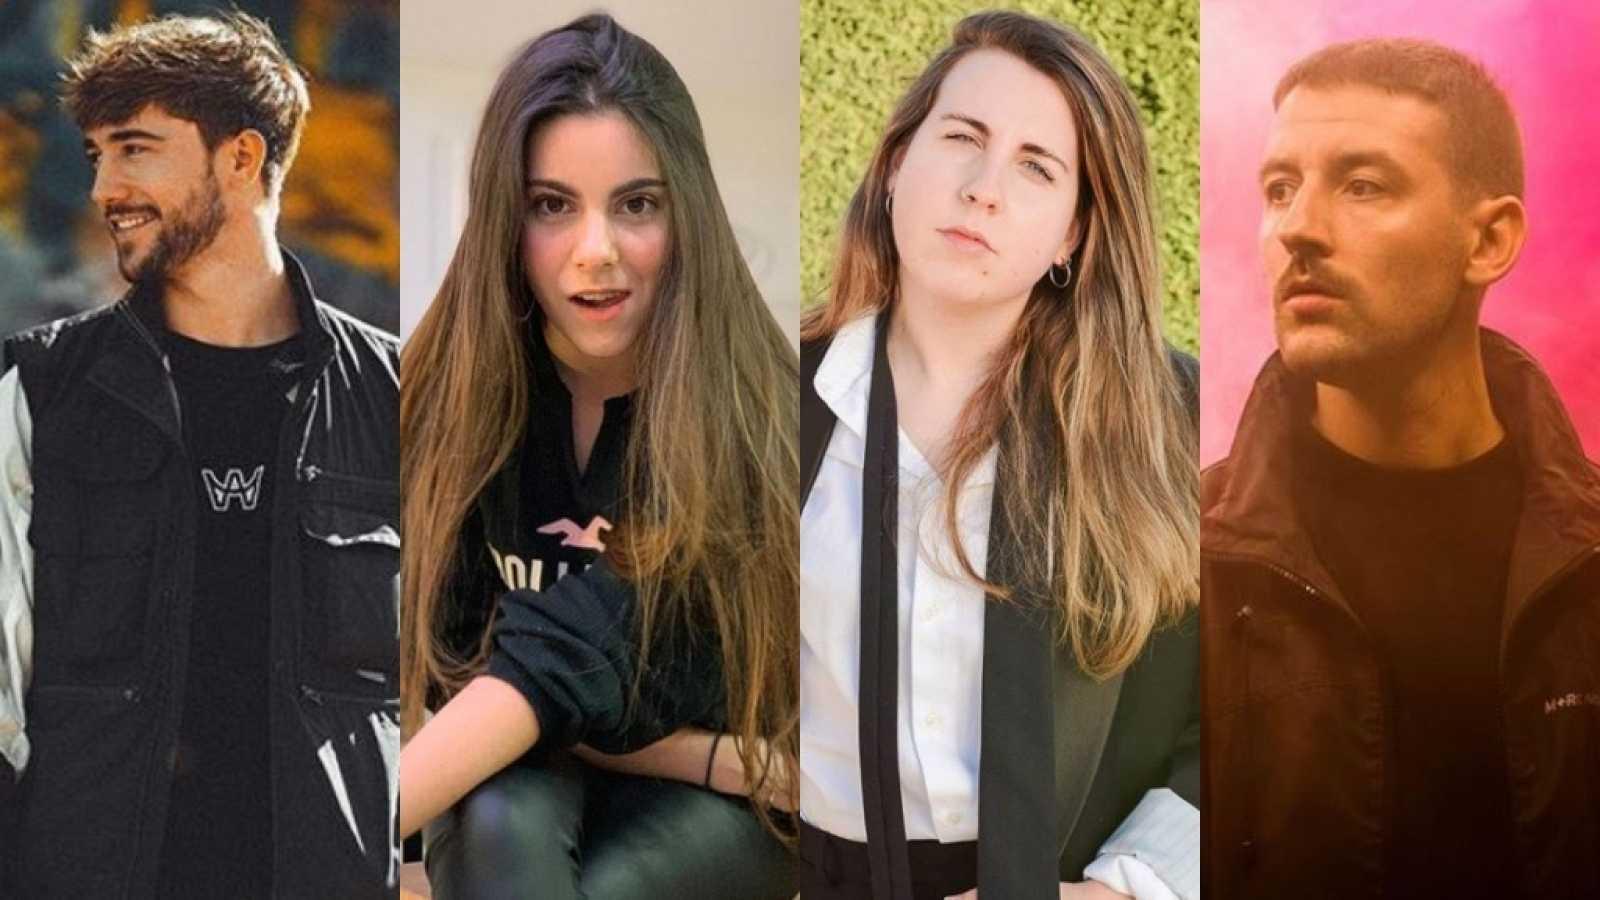 Guille y Shifer What, Martina D'Antiochia, Carolina Iglesias y Erik Urano